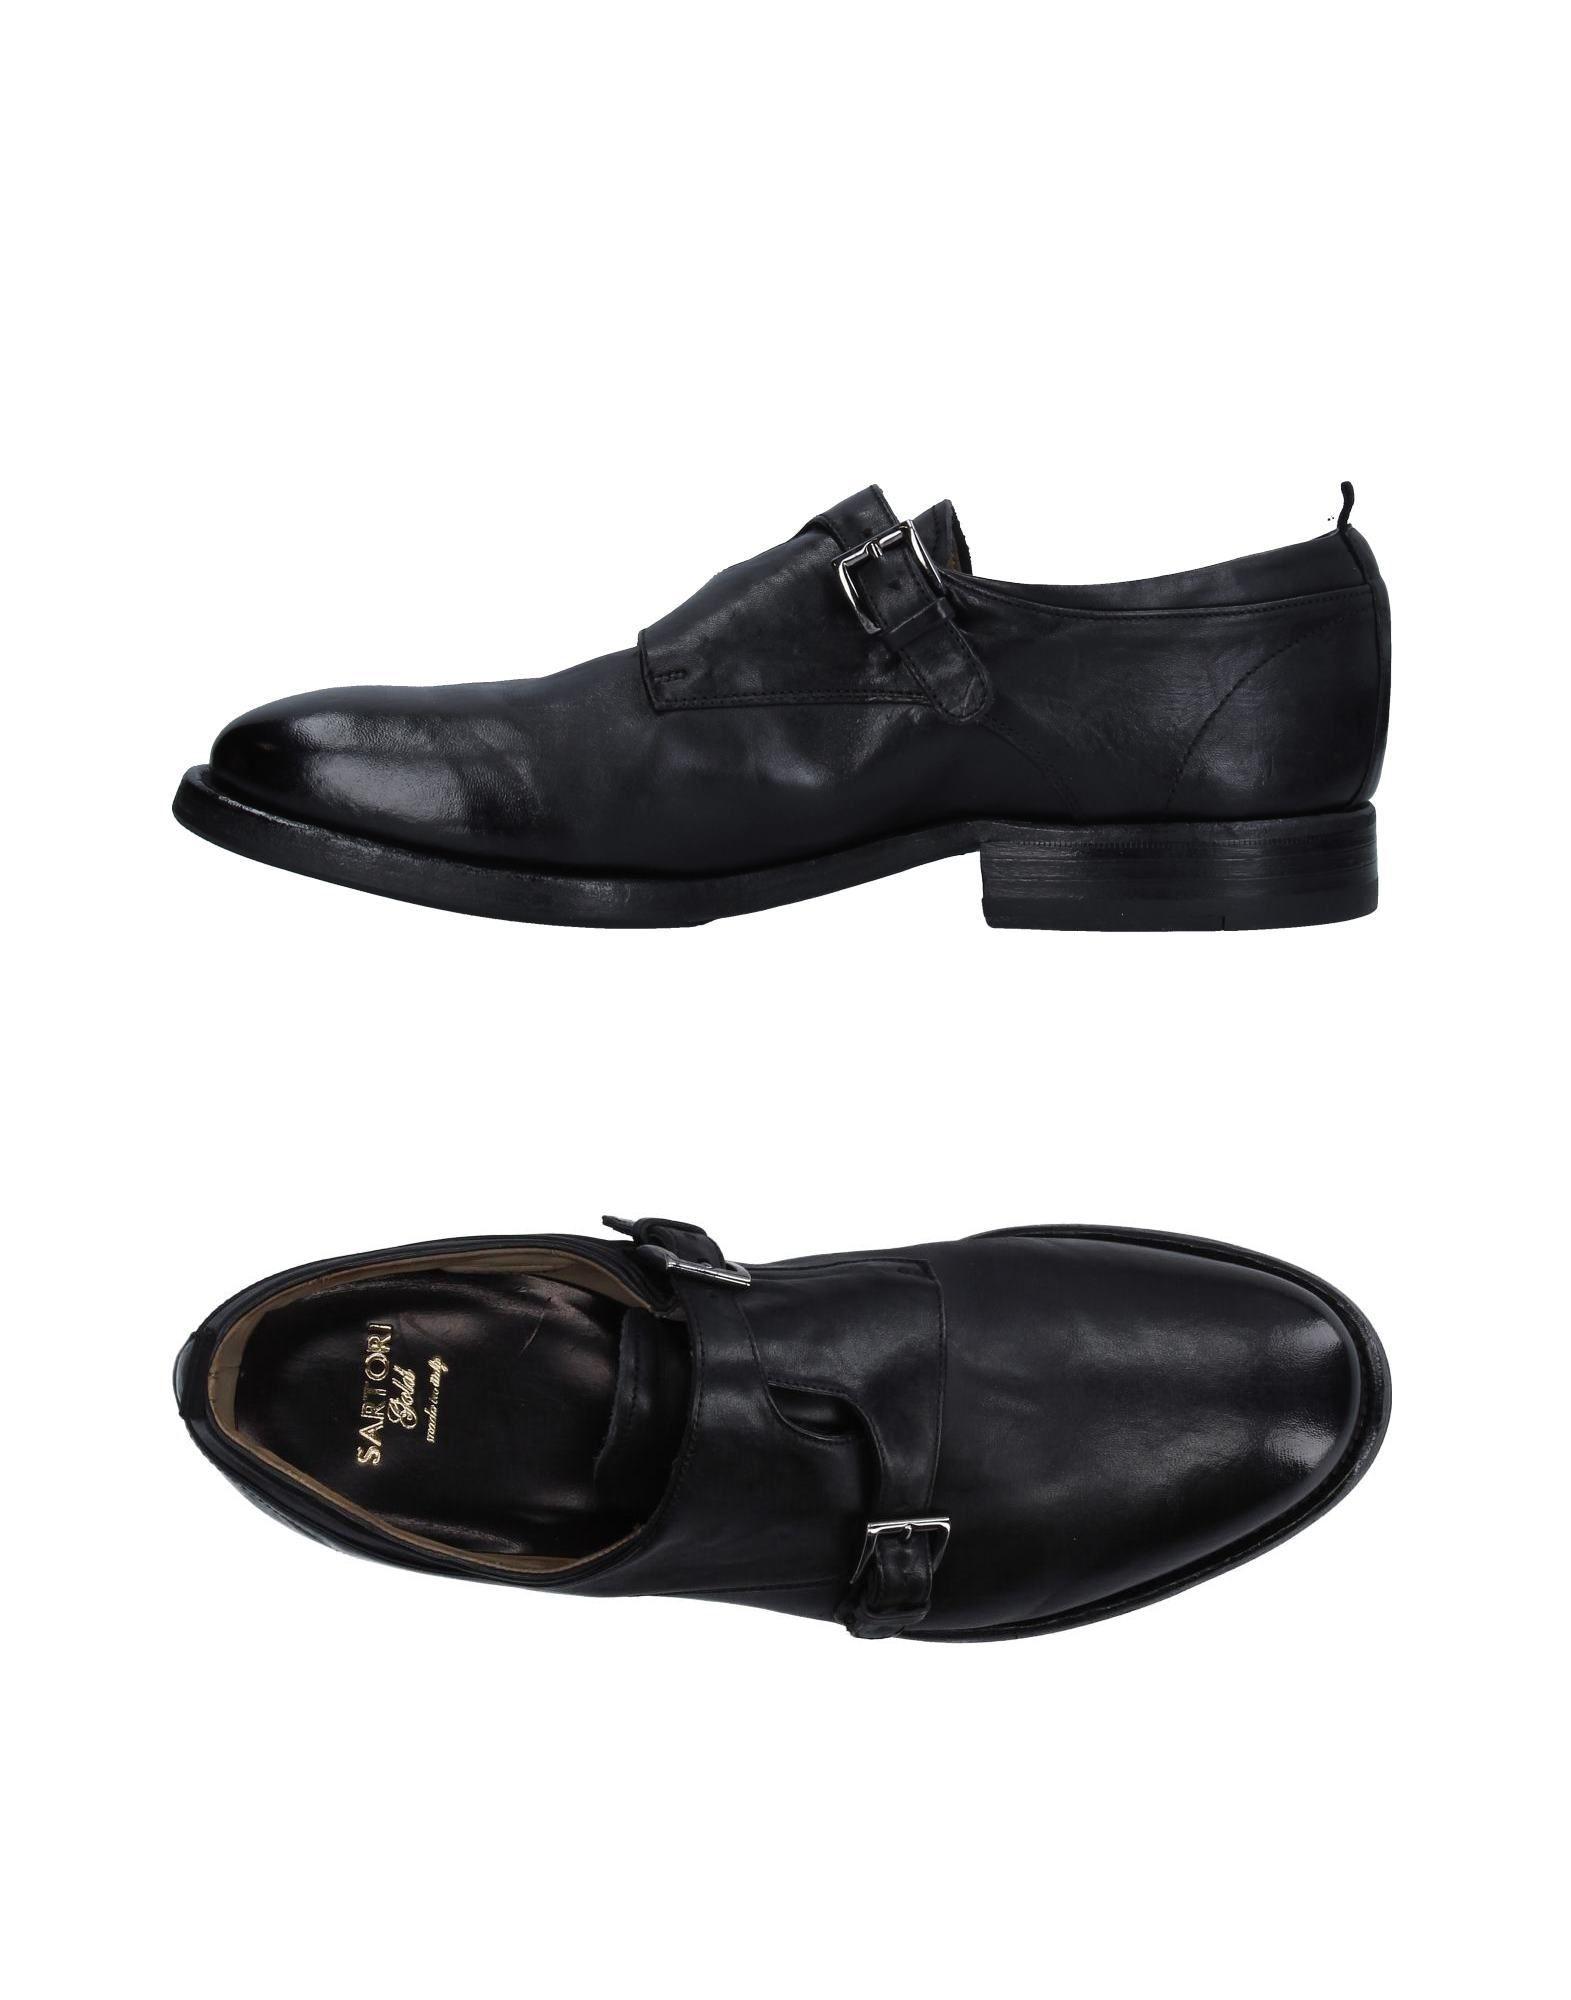 Sartori Gold Mokassins Herren  11247630GA Gute Qualität beliebte Schuhe